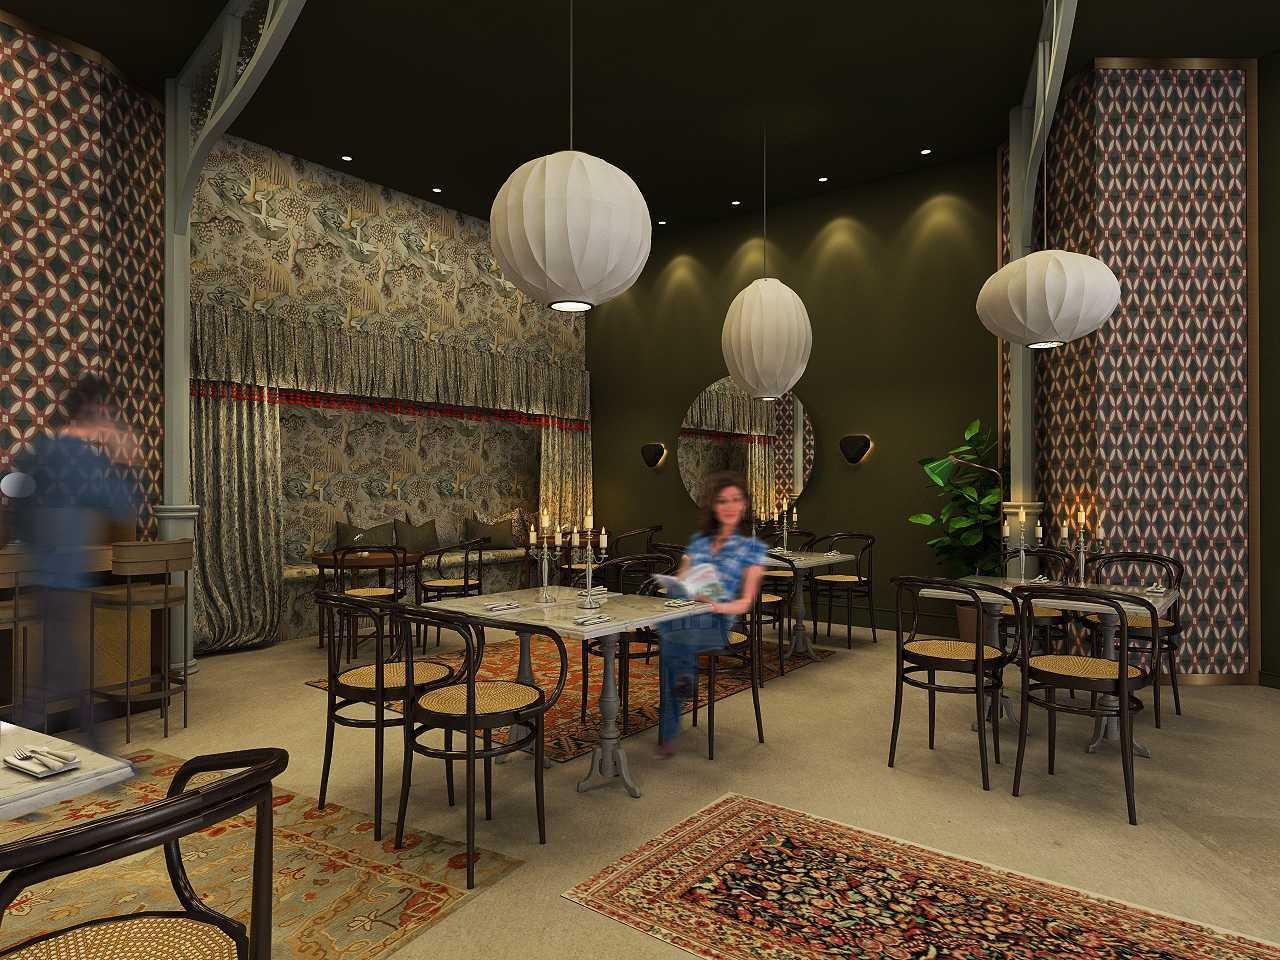 Studio Ig Interior Soematra Flower Cafe Kota Sby, Jawa Timur, Indonesia Kota Sby, Jawa Timur, Indonesia Seating Area Restaurant  49631